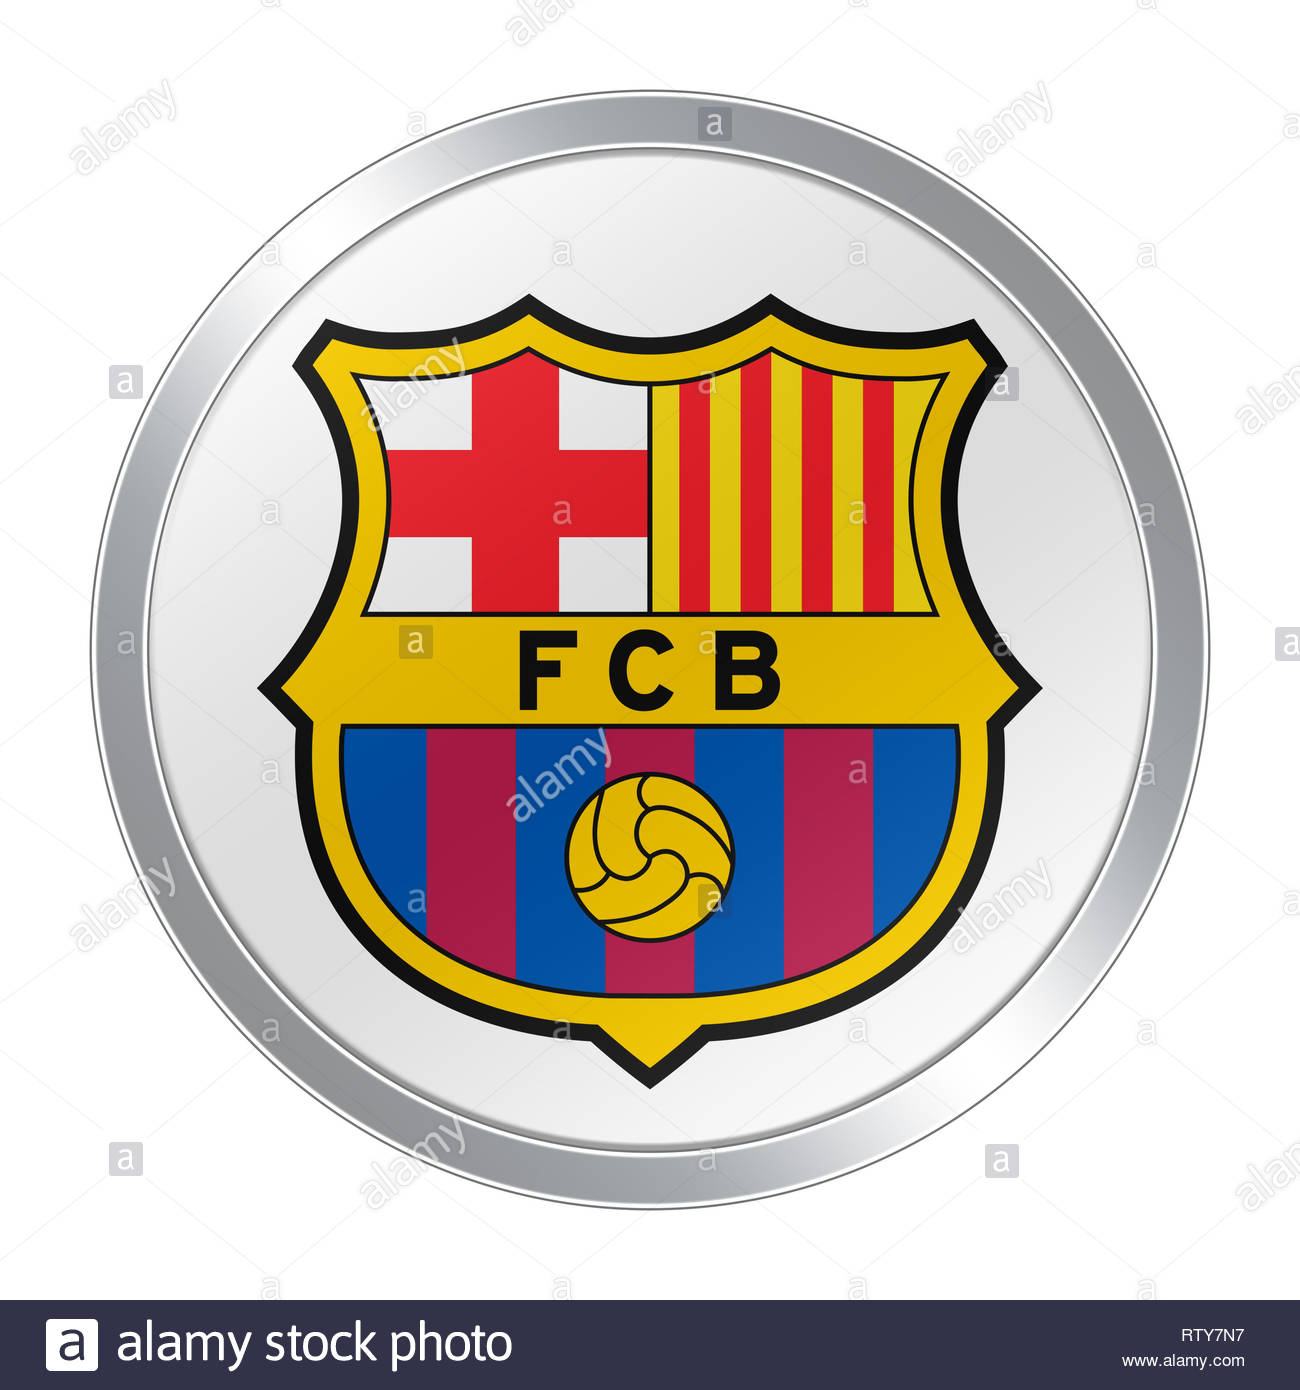 FC Barcelona Barca logo icon - Stock Image